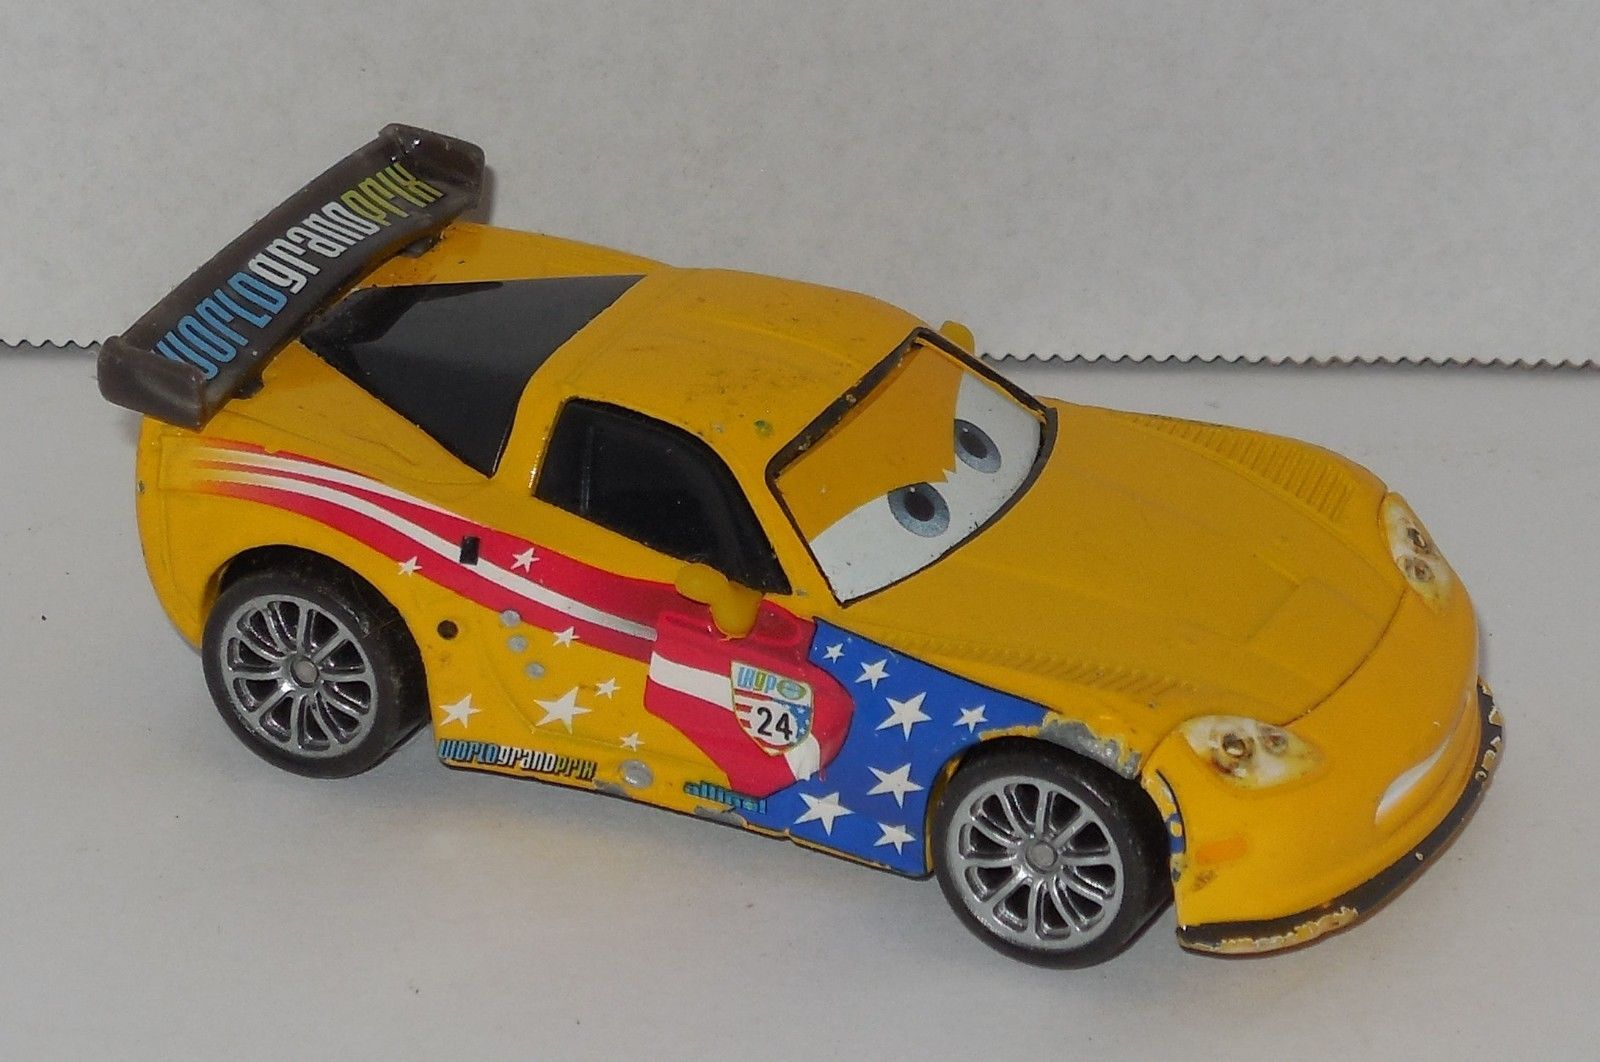 Disney Cars Wgp World Grand Prix Jeff and 50 similar items. S l1600